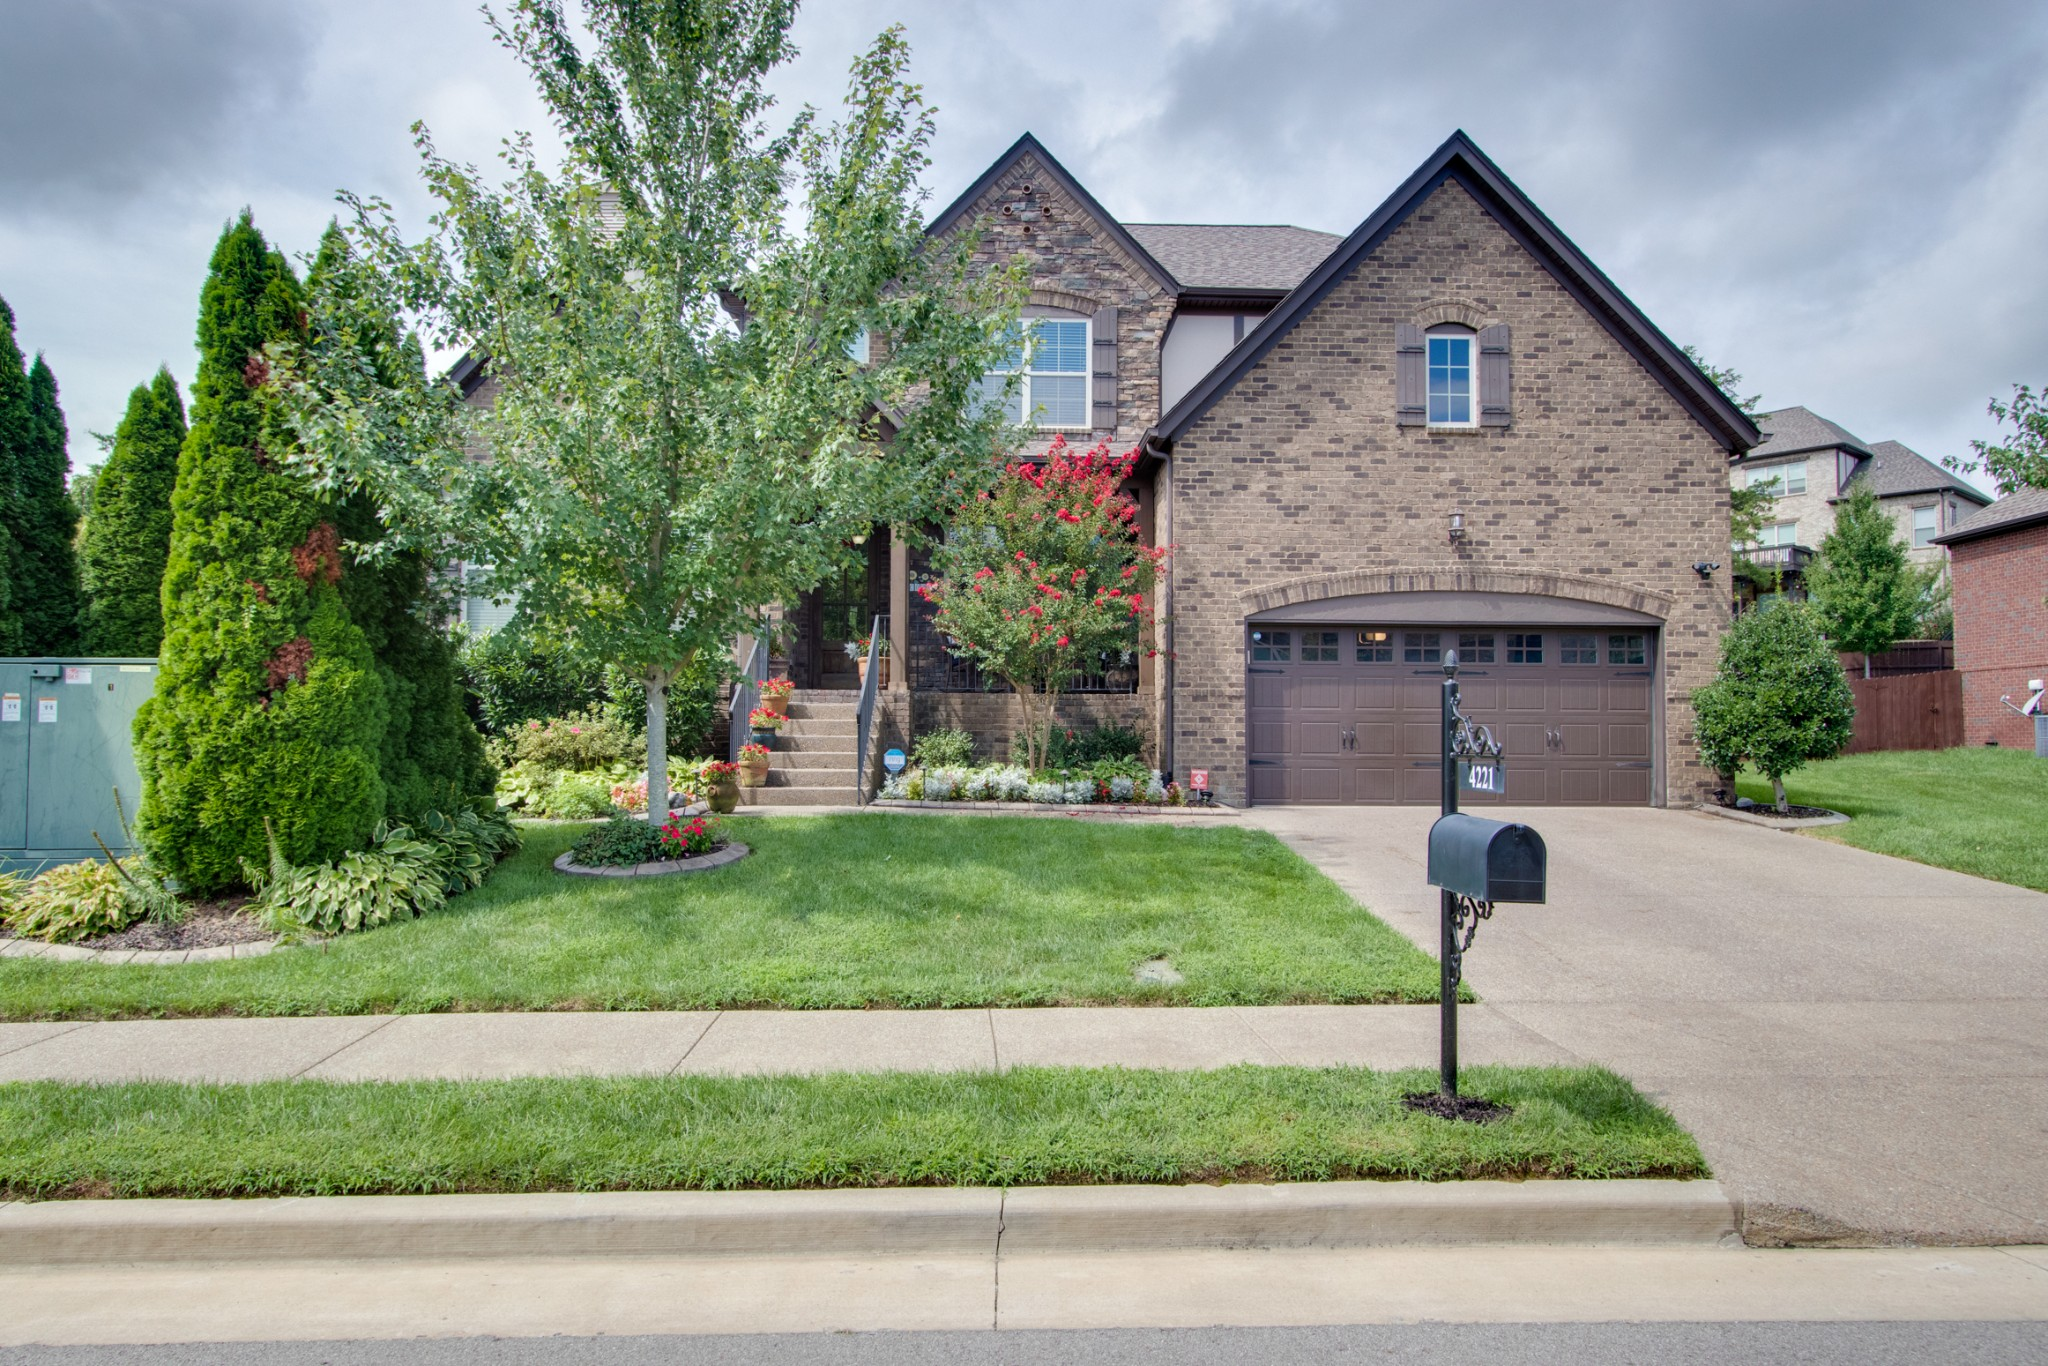 4221 Stone Hall Blvd Property Photo - Hermitage, TN real estate listing